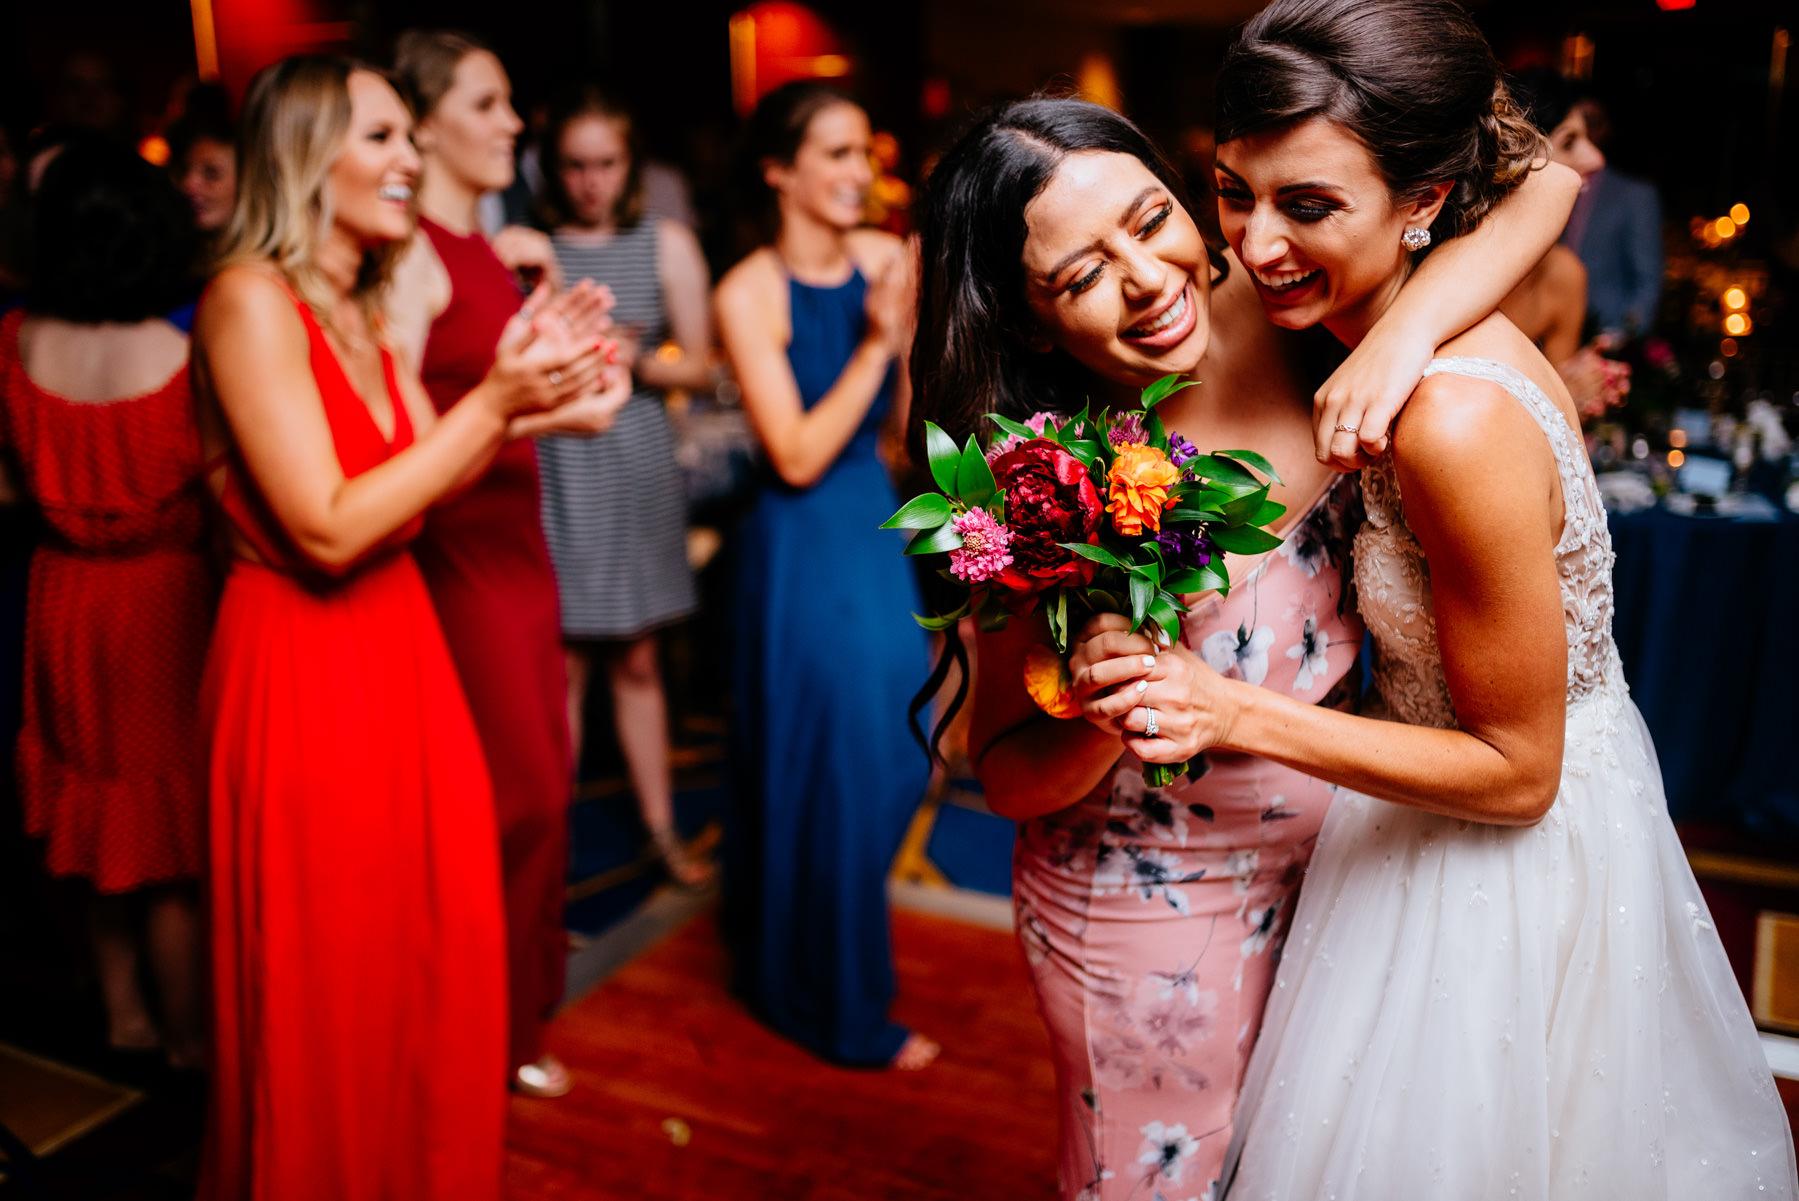 hugging bride during reception